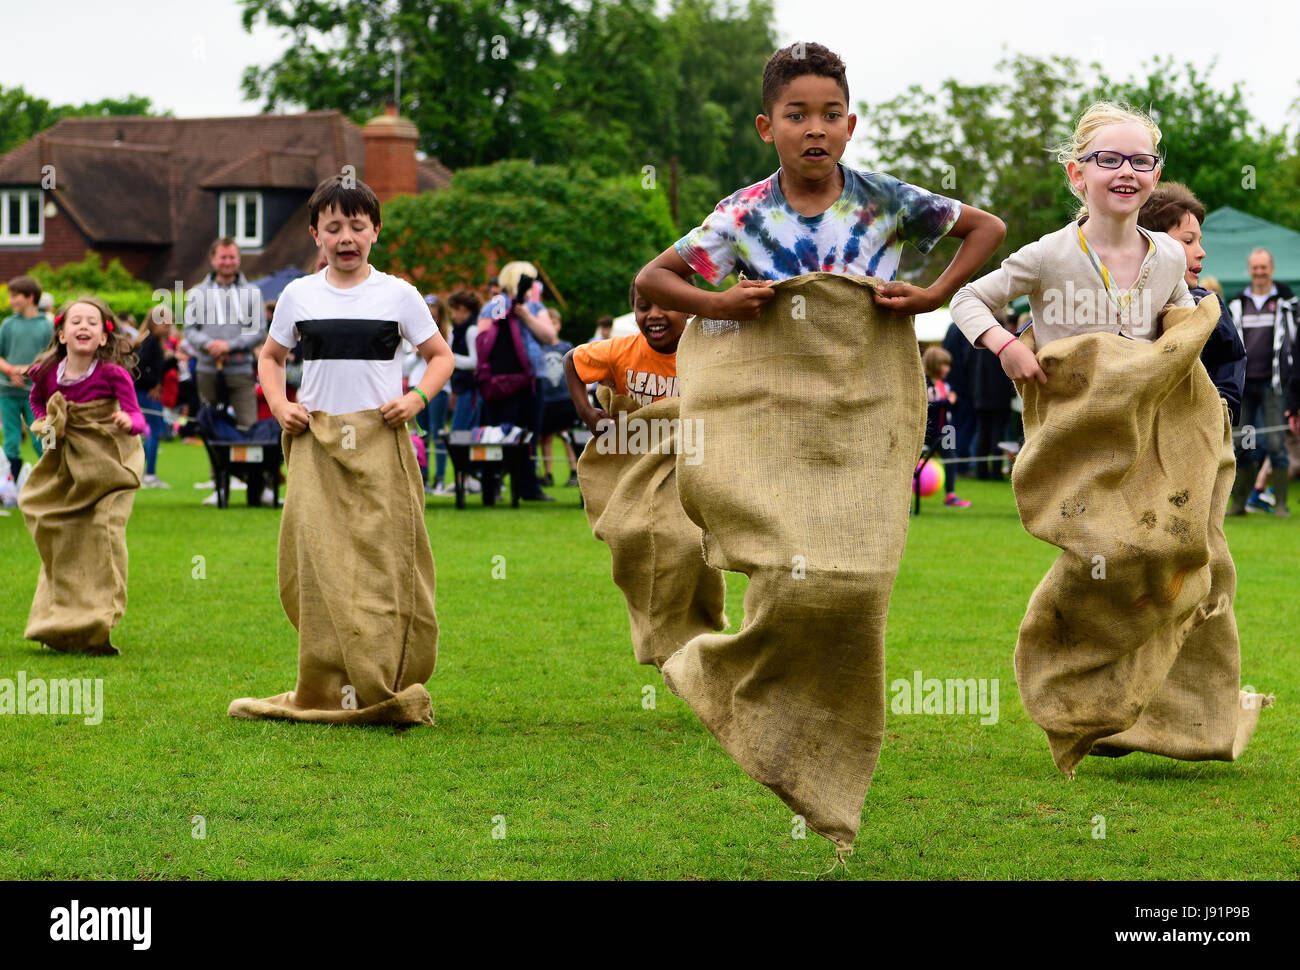 Children's sack race, village fair, Rowledge, UK. 29.05.2017. - Stock Image